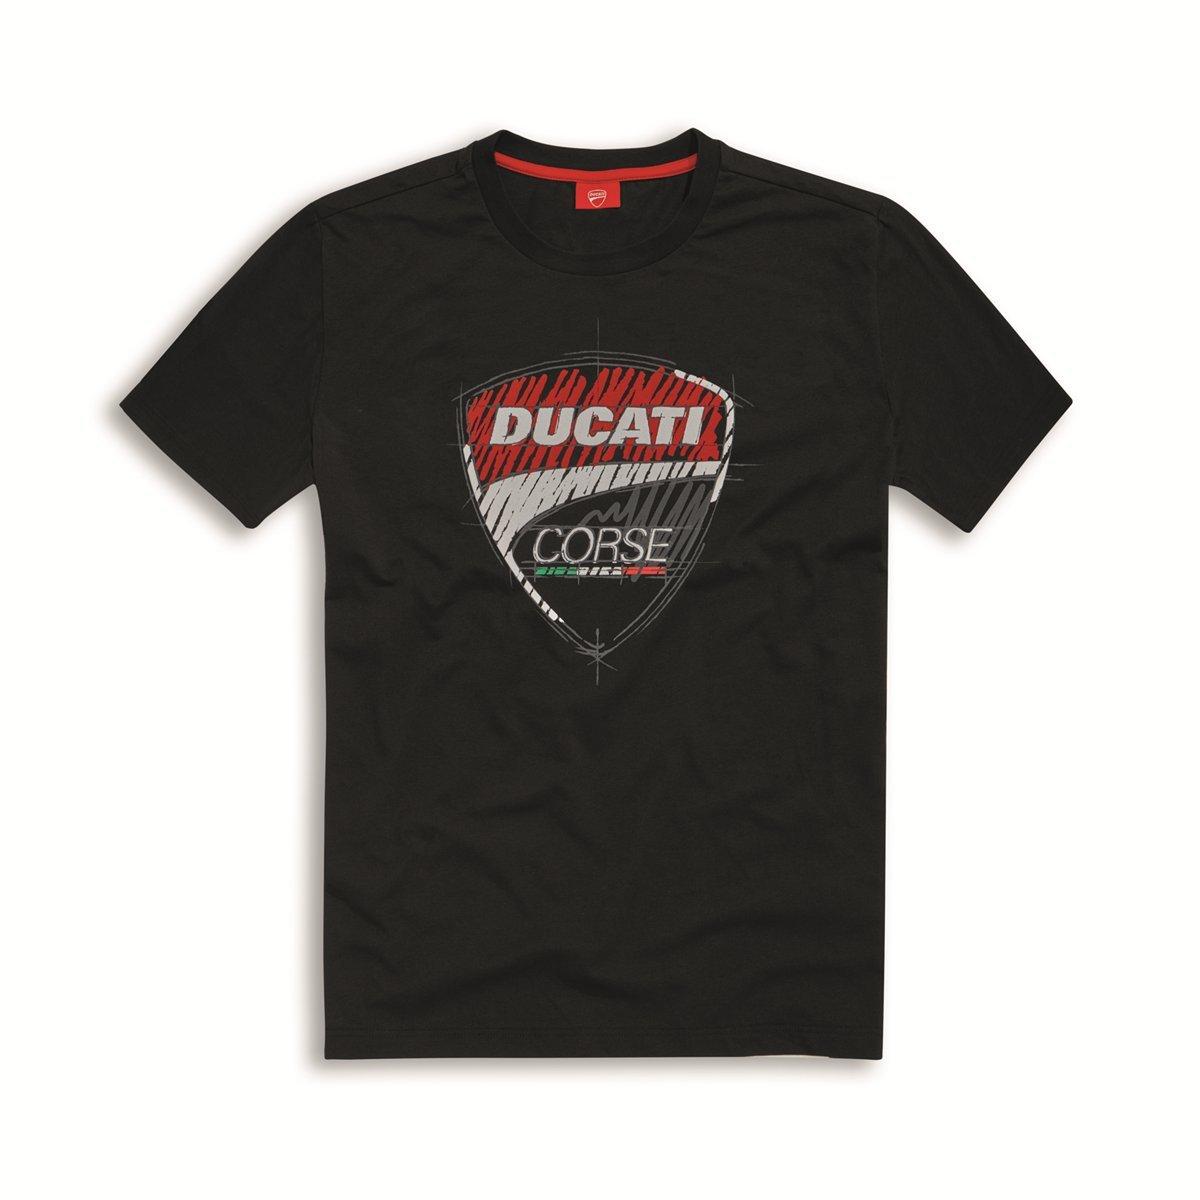 Ducati Corse Sketch T-shirt Black Size Large